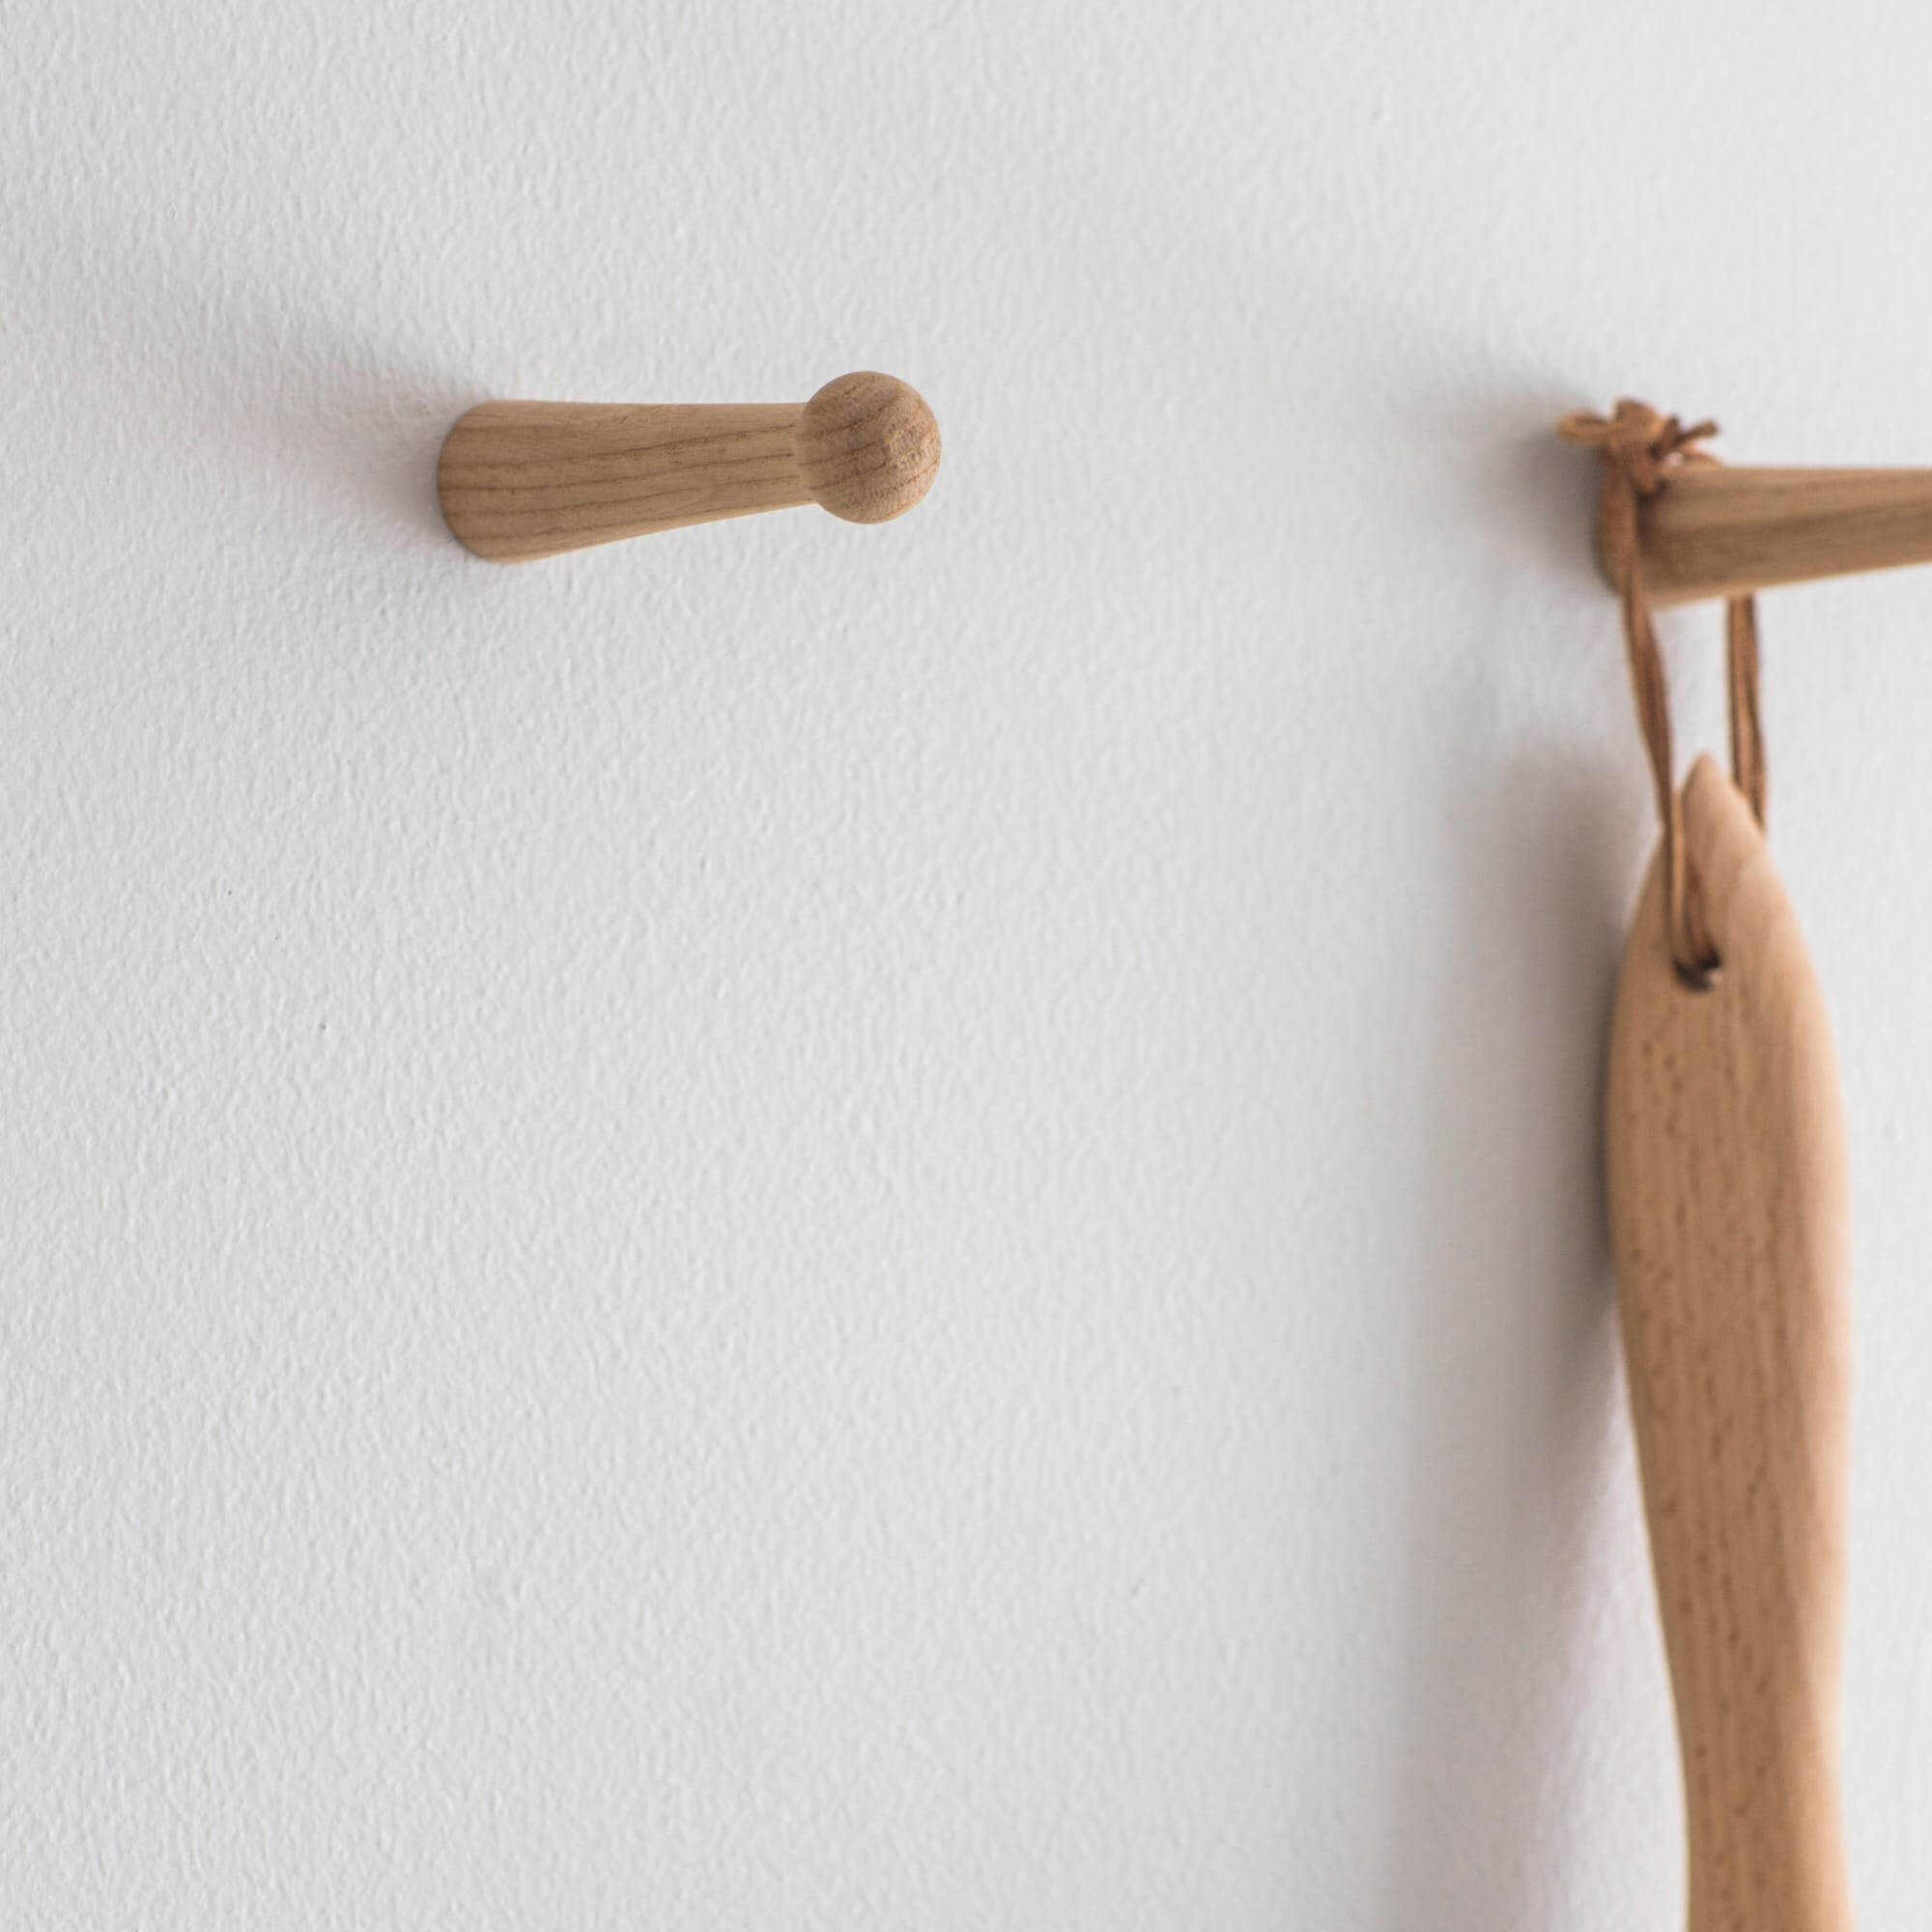 Oak Peg Hooks - Set of 2 save 15%